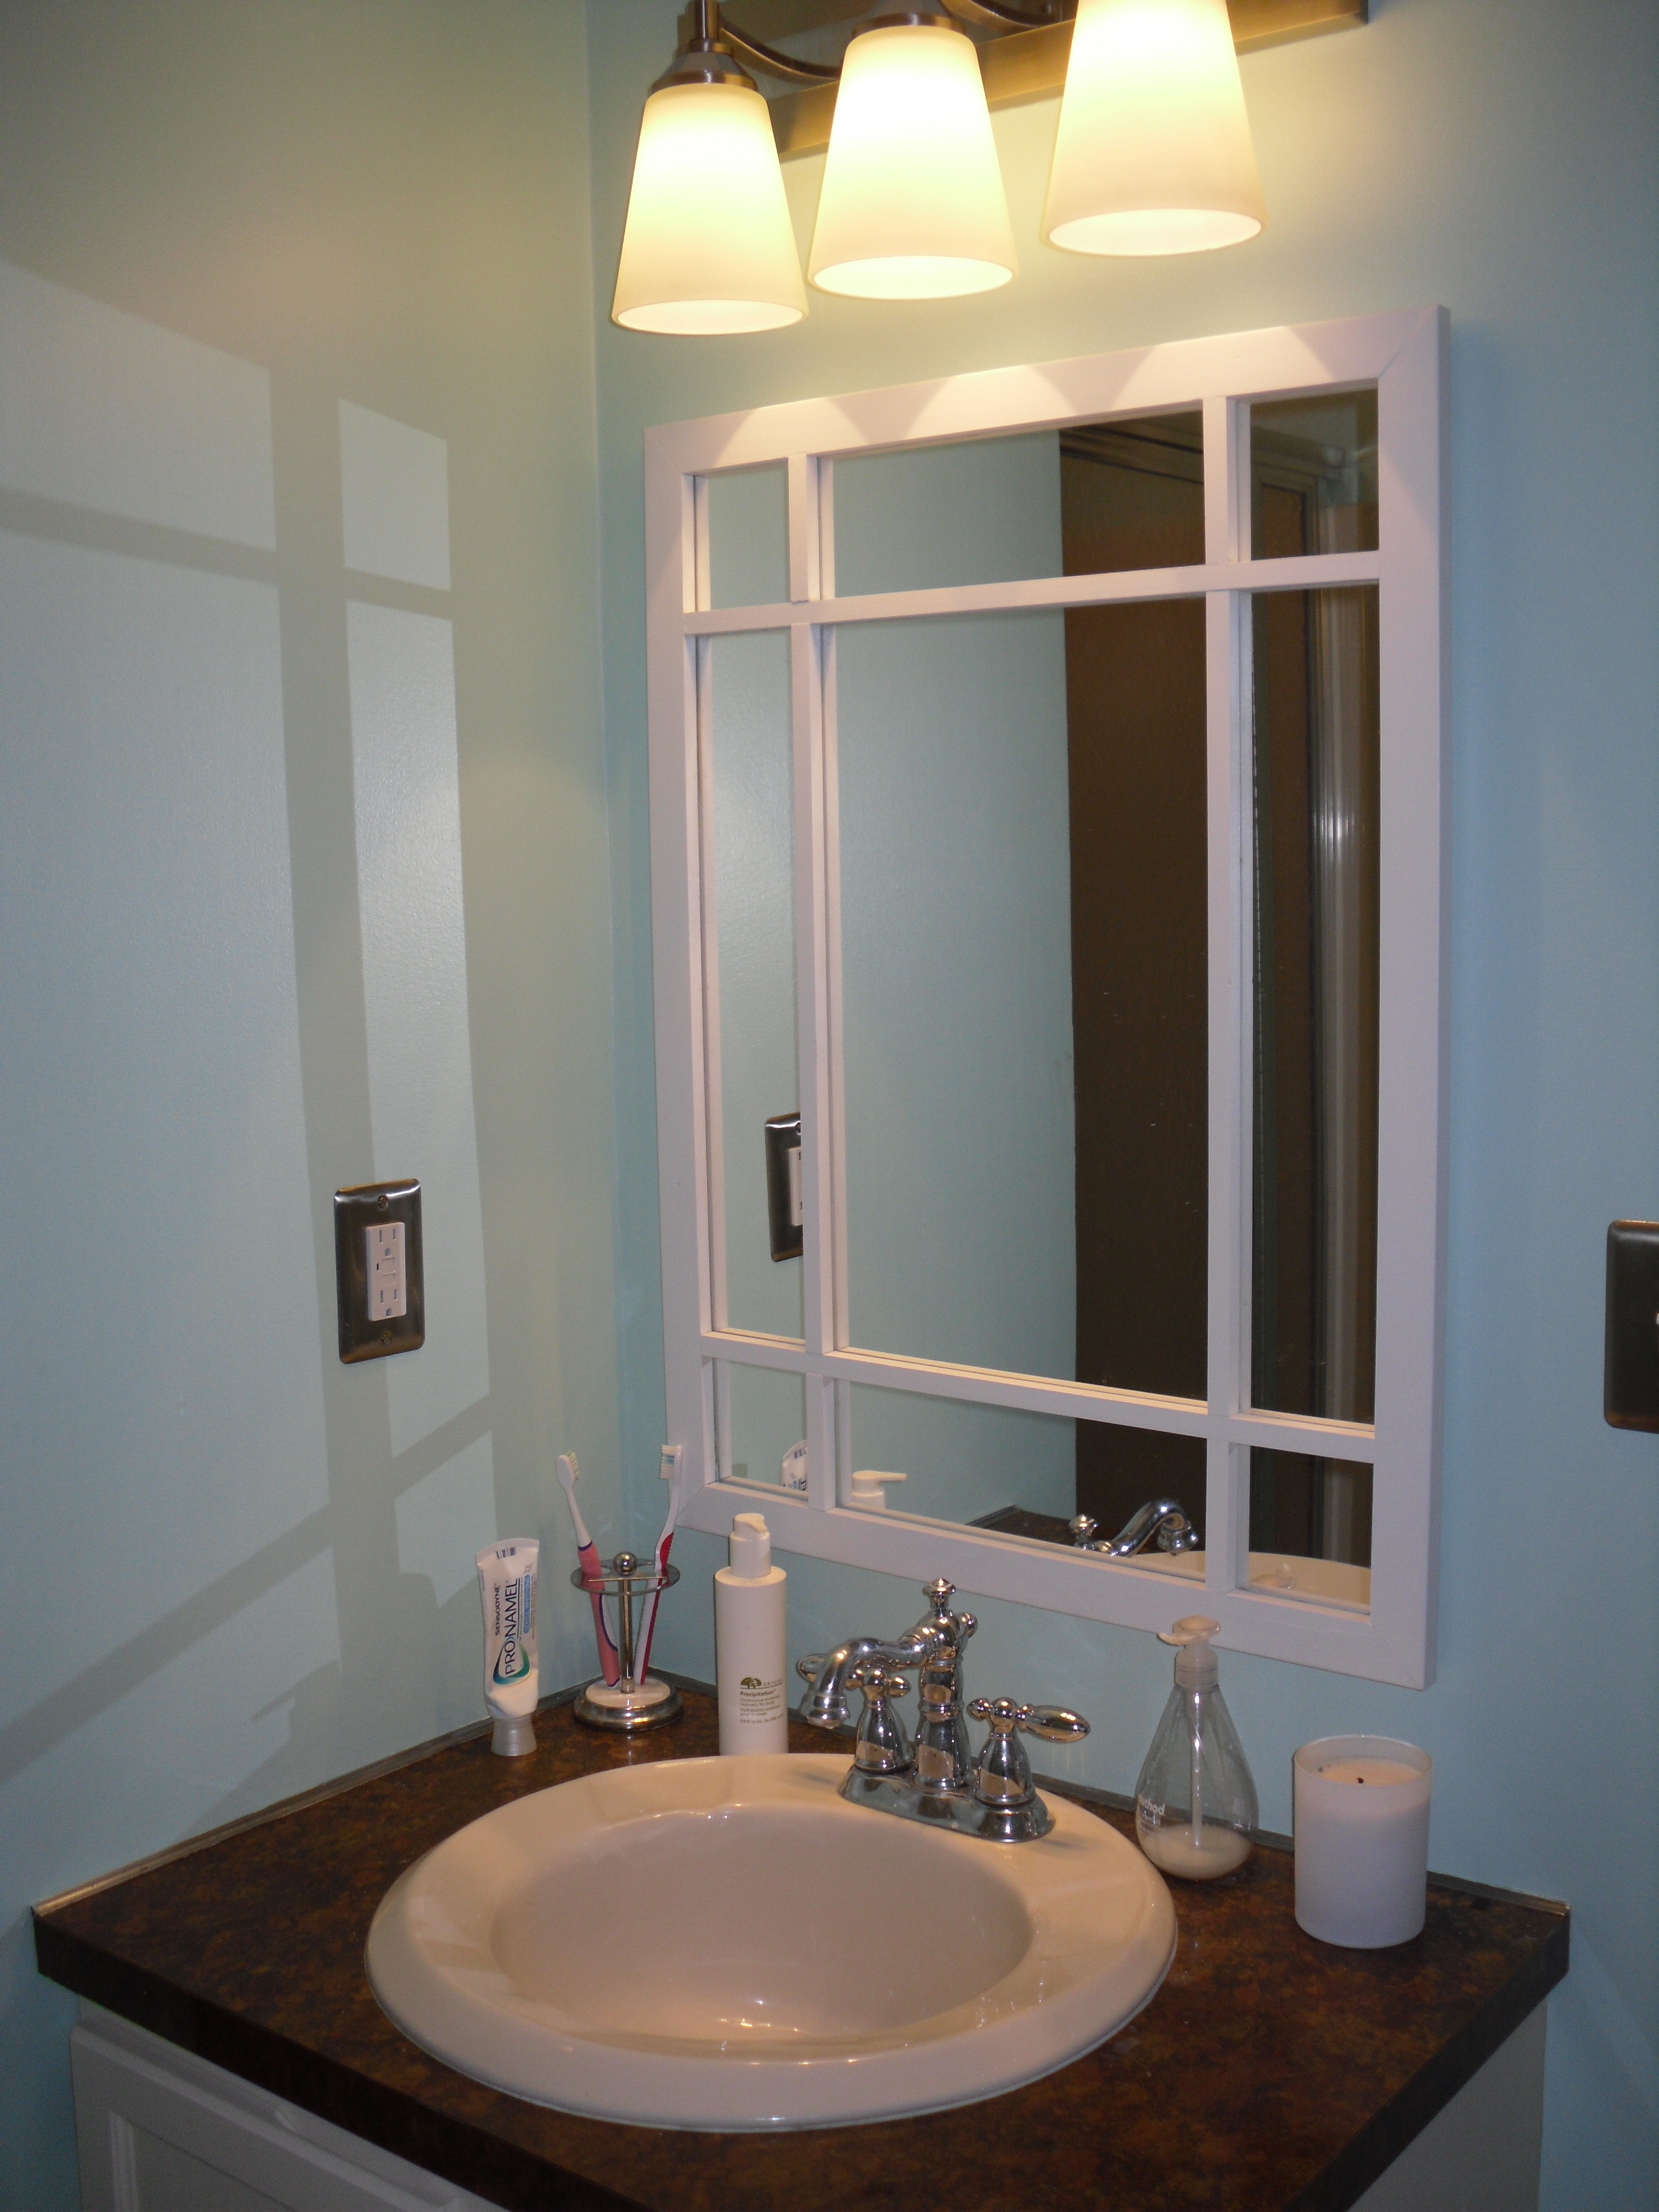 small-bathroom-ideas-for-small-bathrooms-on-a-budget-ideas-for-small-bathrooms-with-shower-ideas-for-small-bathrooms-with-shower-stall-ideas-for-small-bathrooms-with-tub-ideas-for-small-bathroom-w